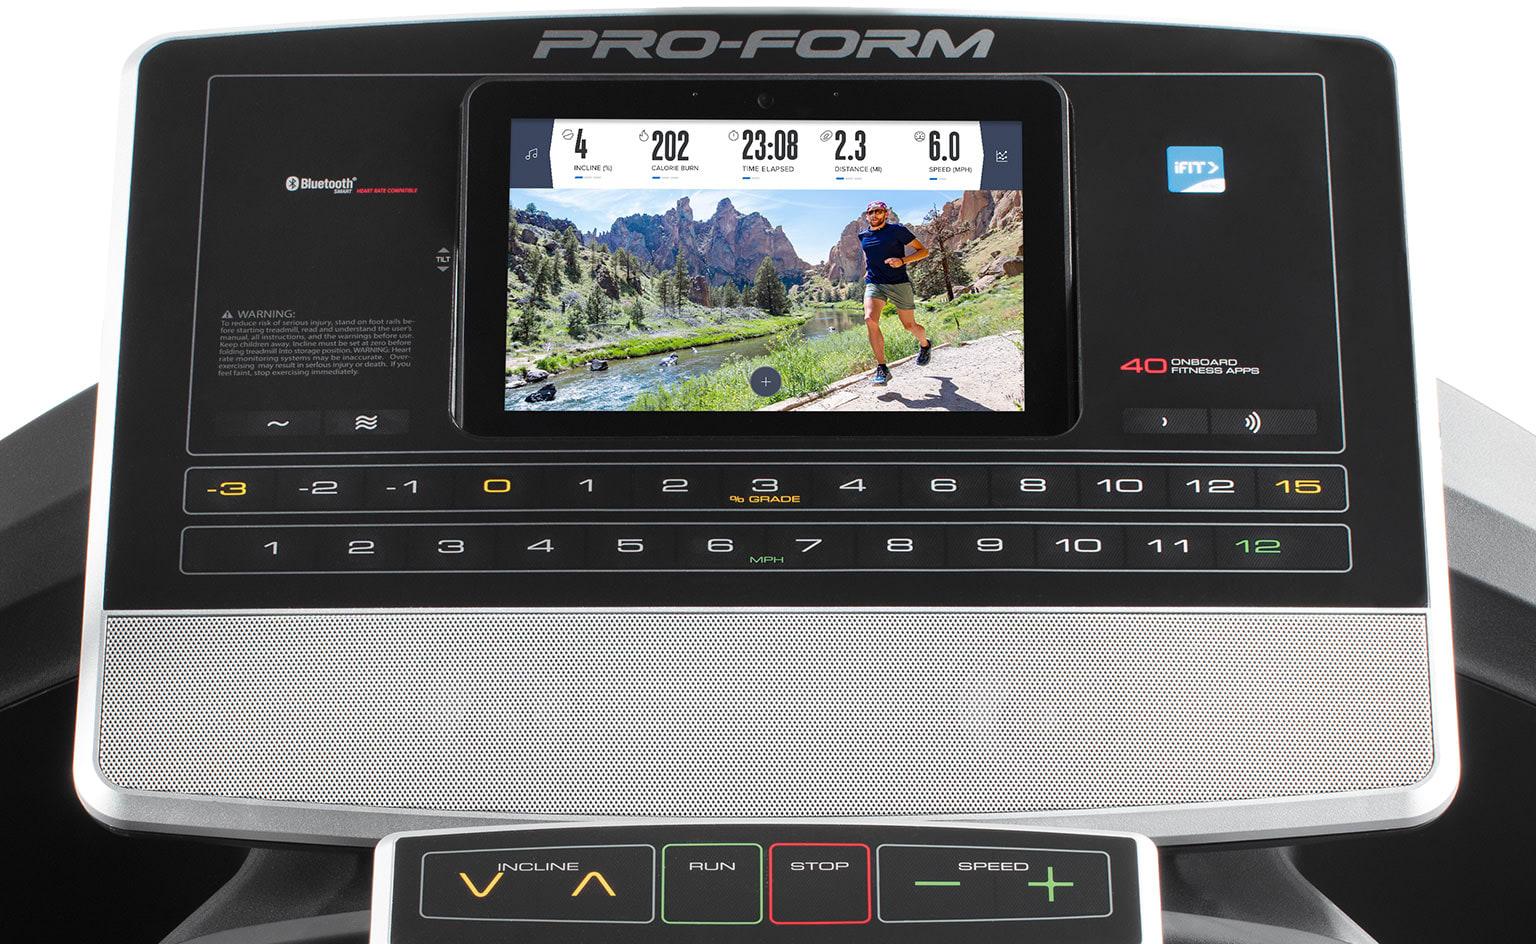 console image for the SMART Pro 9000 treadmill